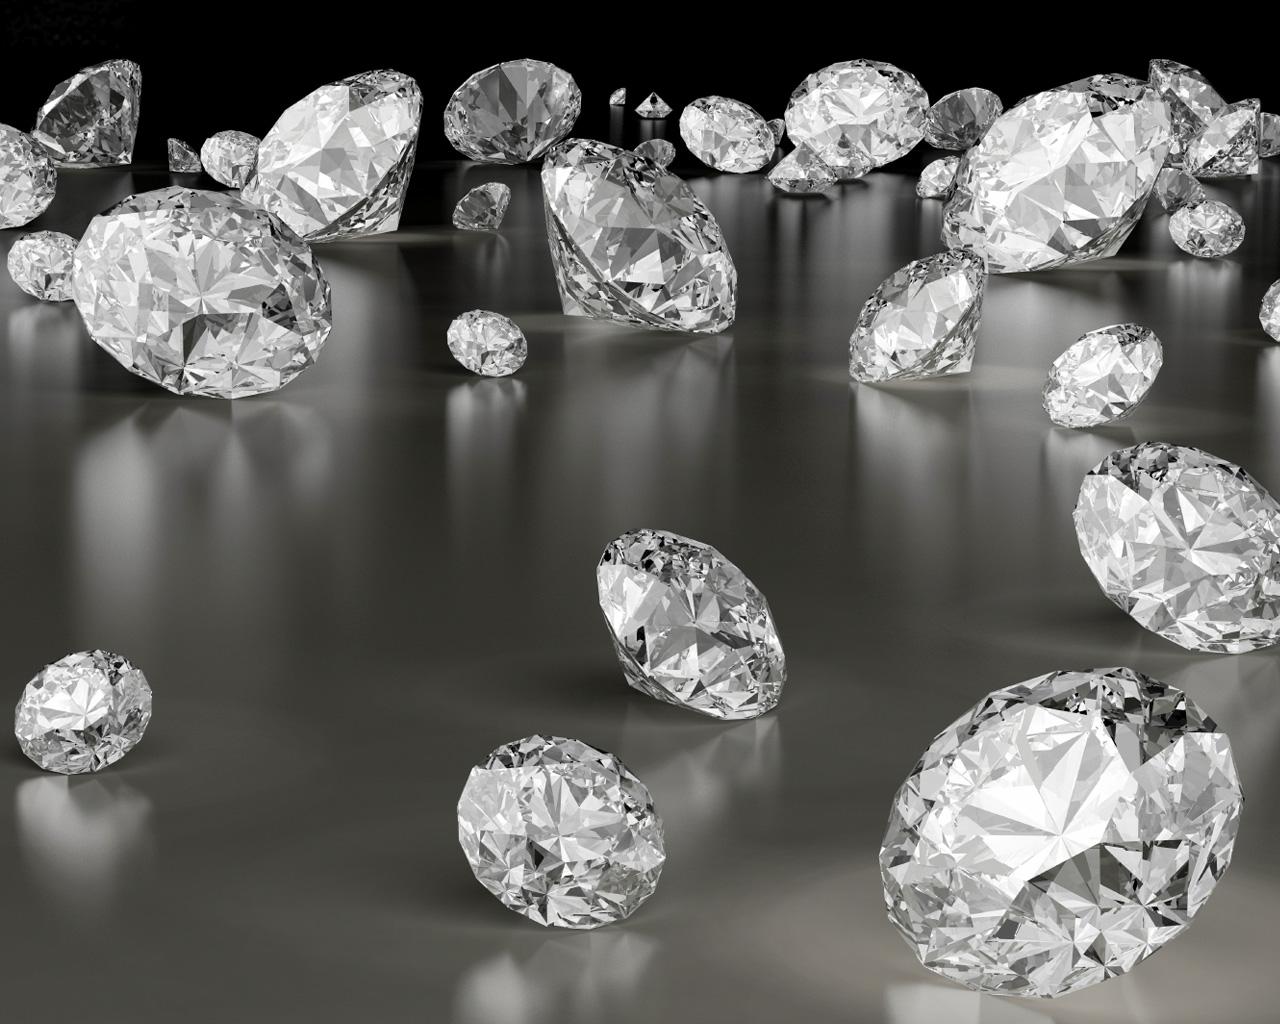 Sackowitz Jewelers Jewels Used In Movies 1280x1024